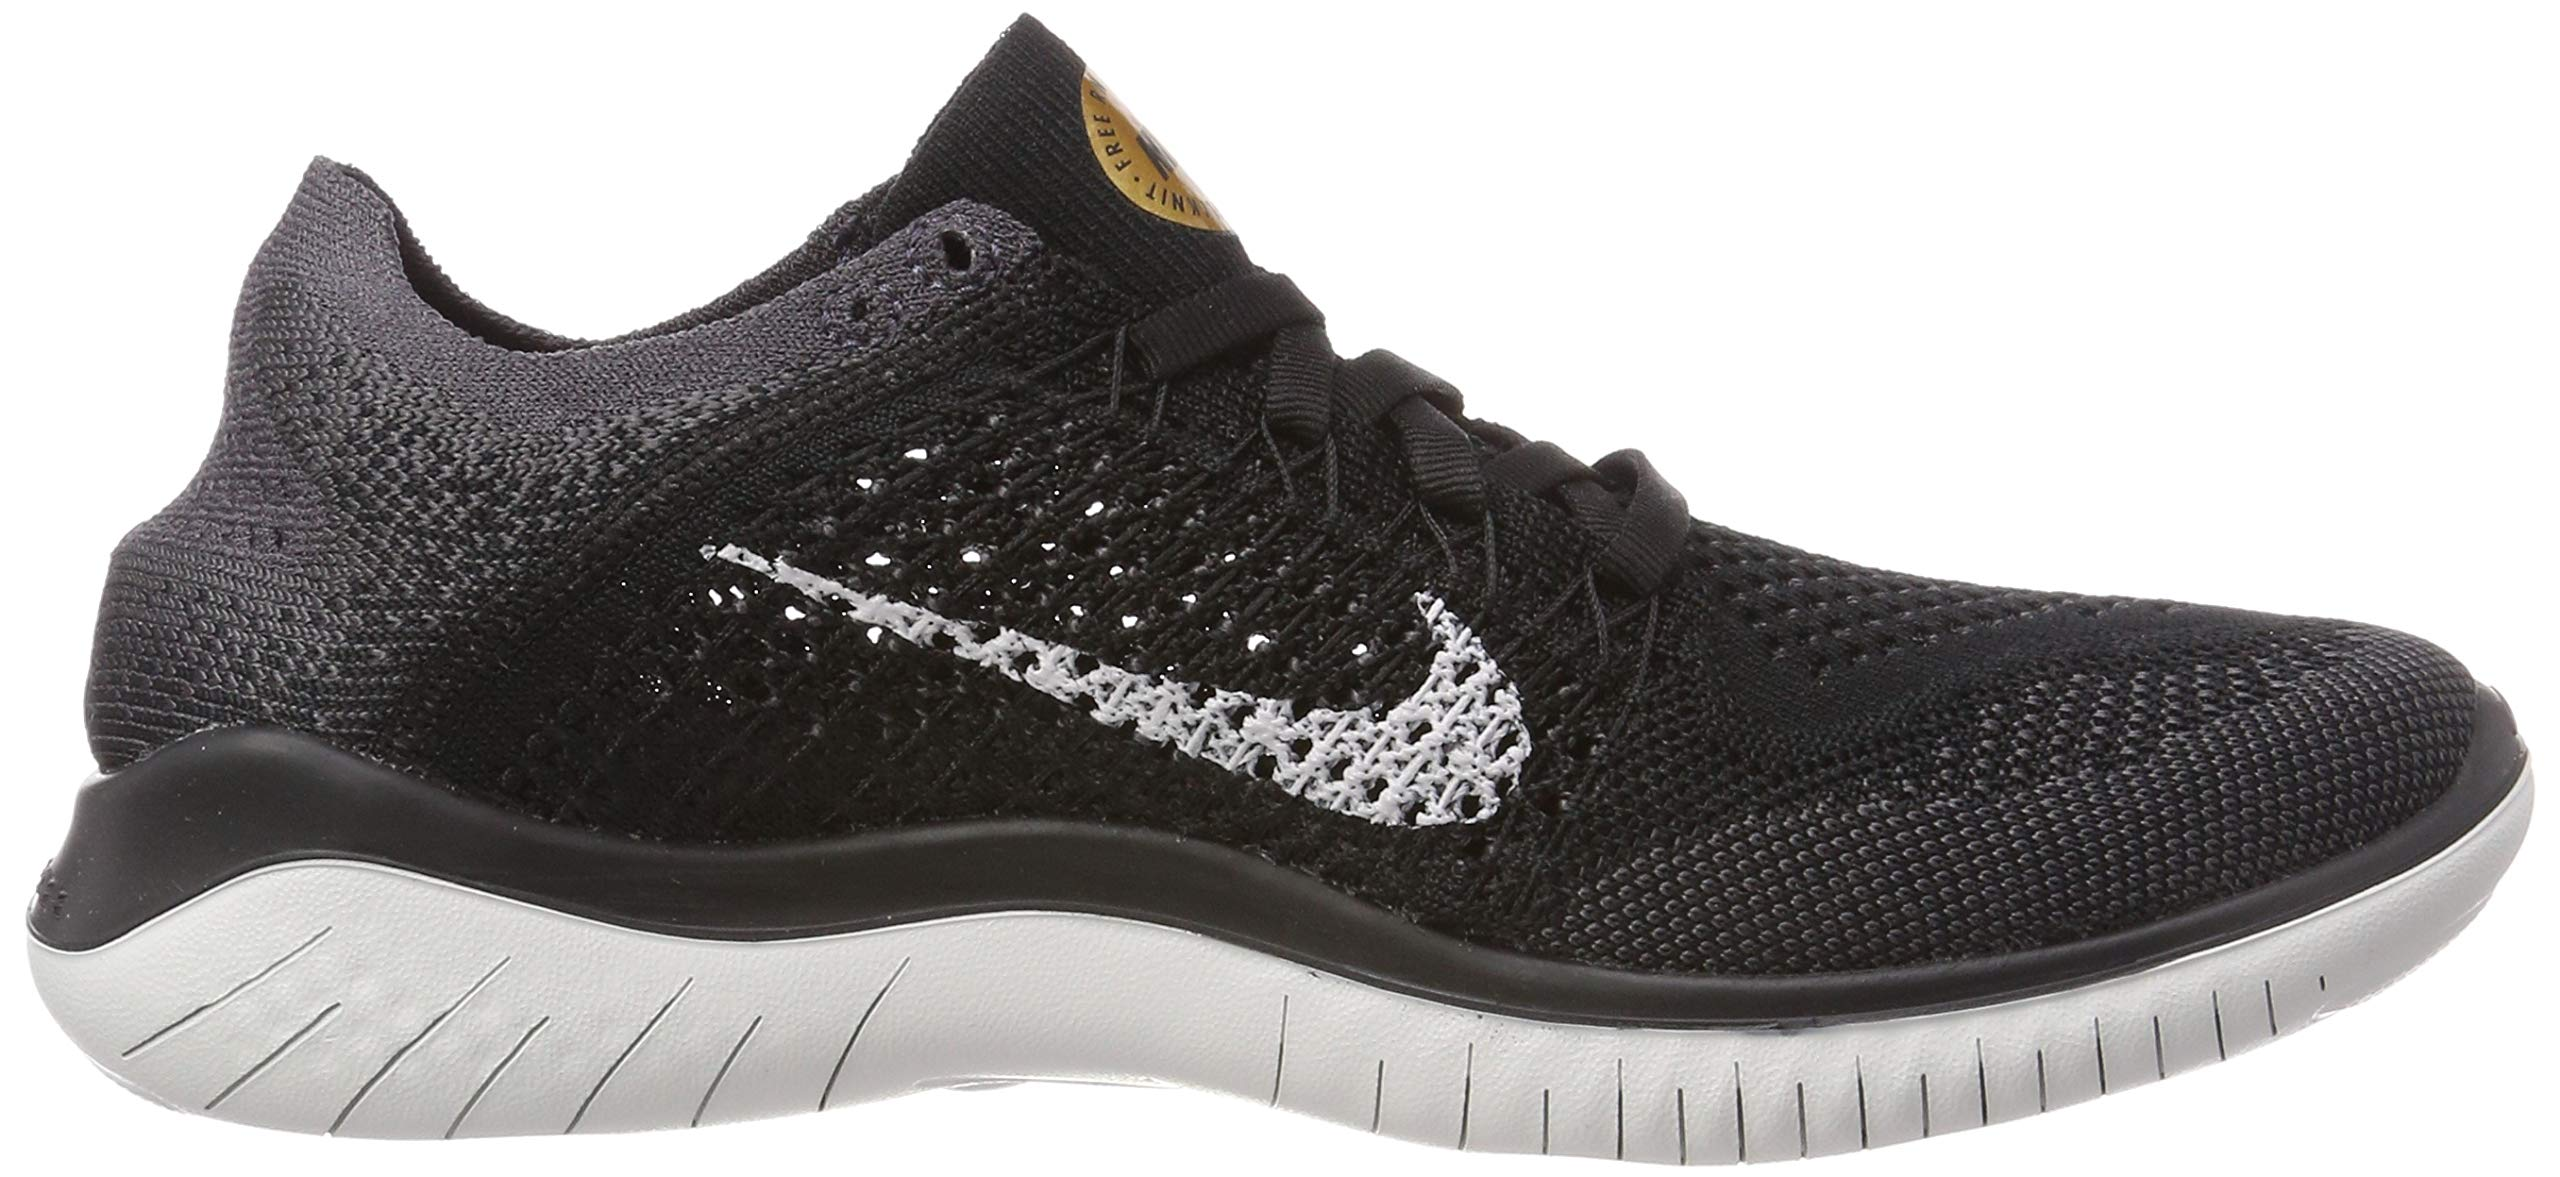 Nike Womens Free Rn Flyknit 2018 Womens 942839-005 Size 5 by Nike (Image #6)